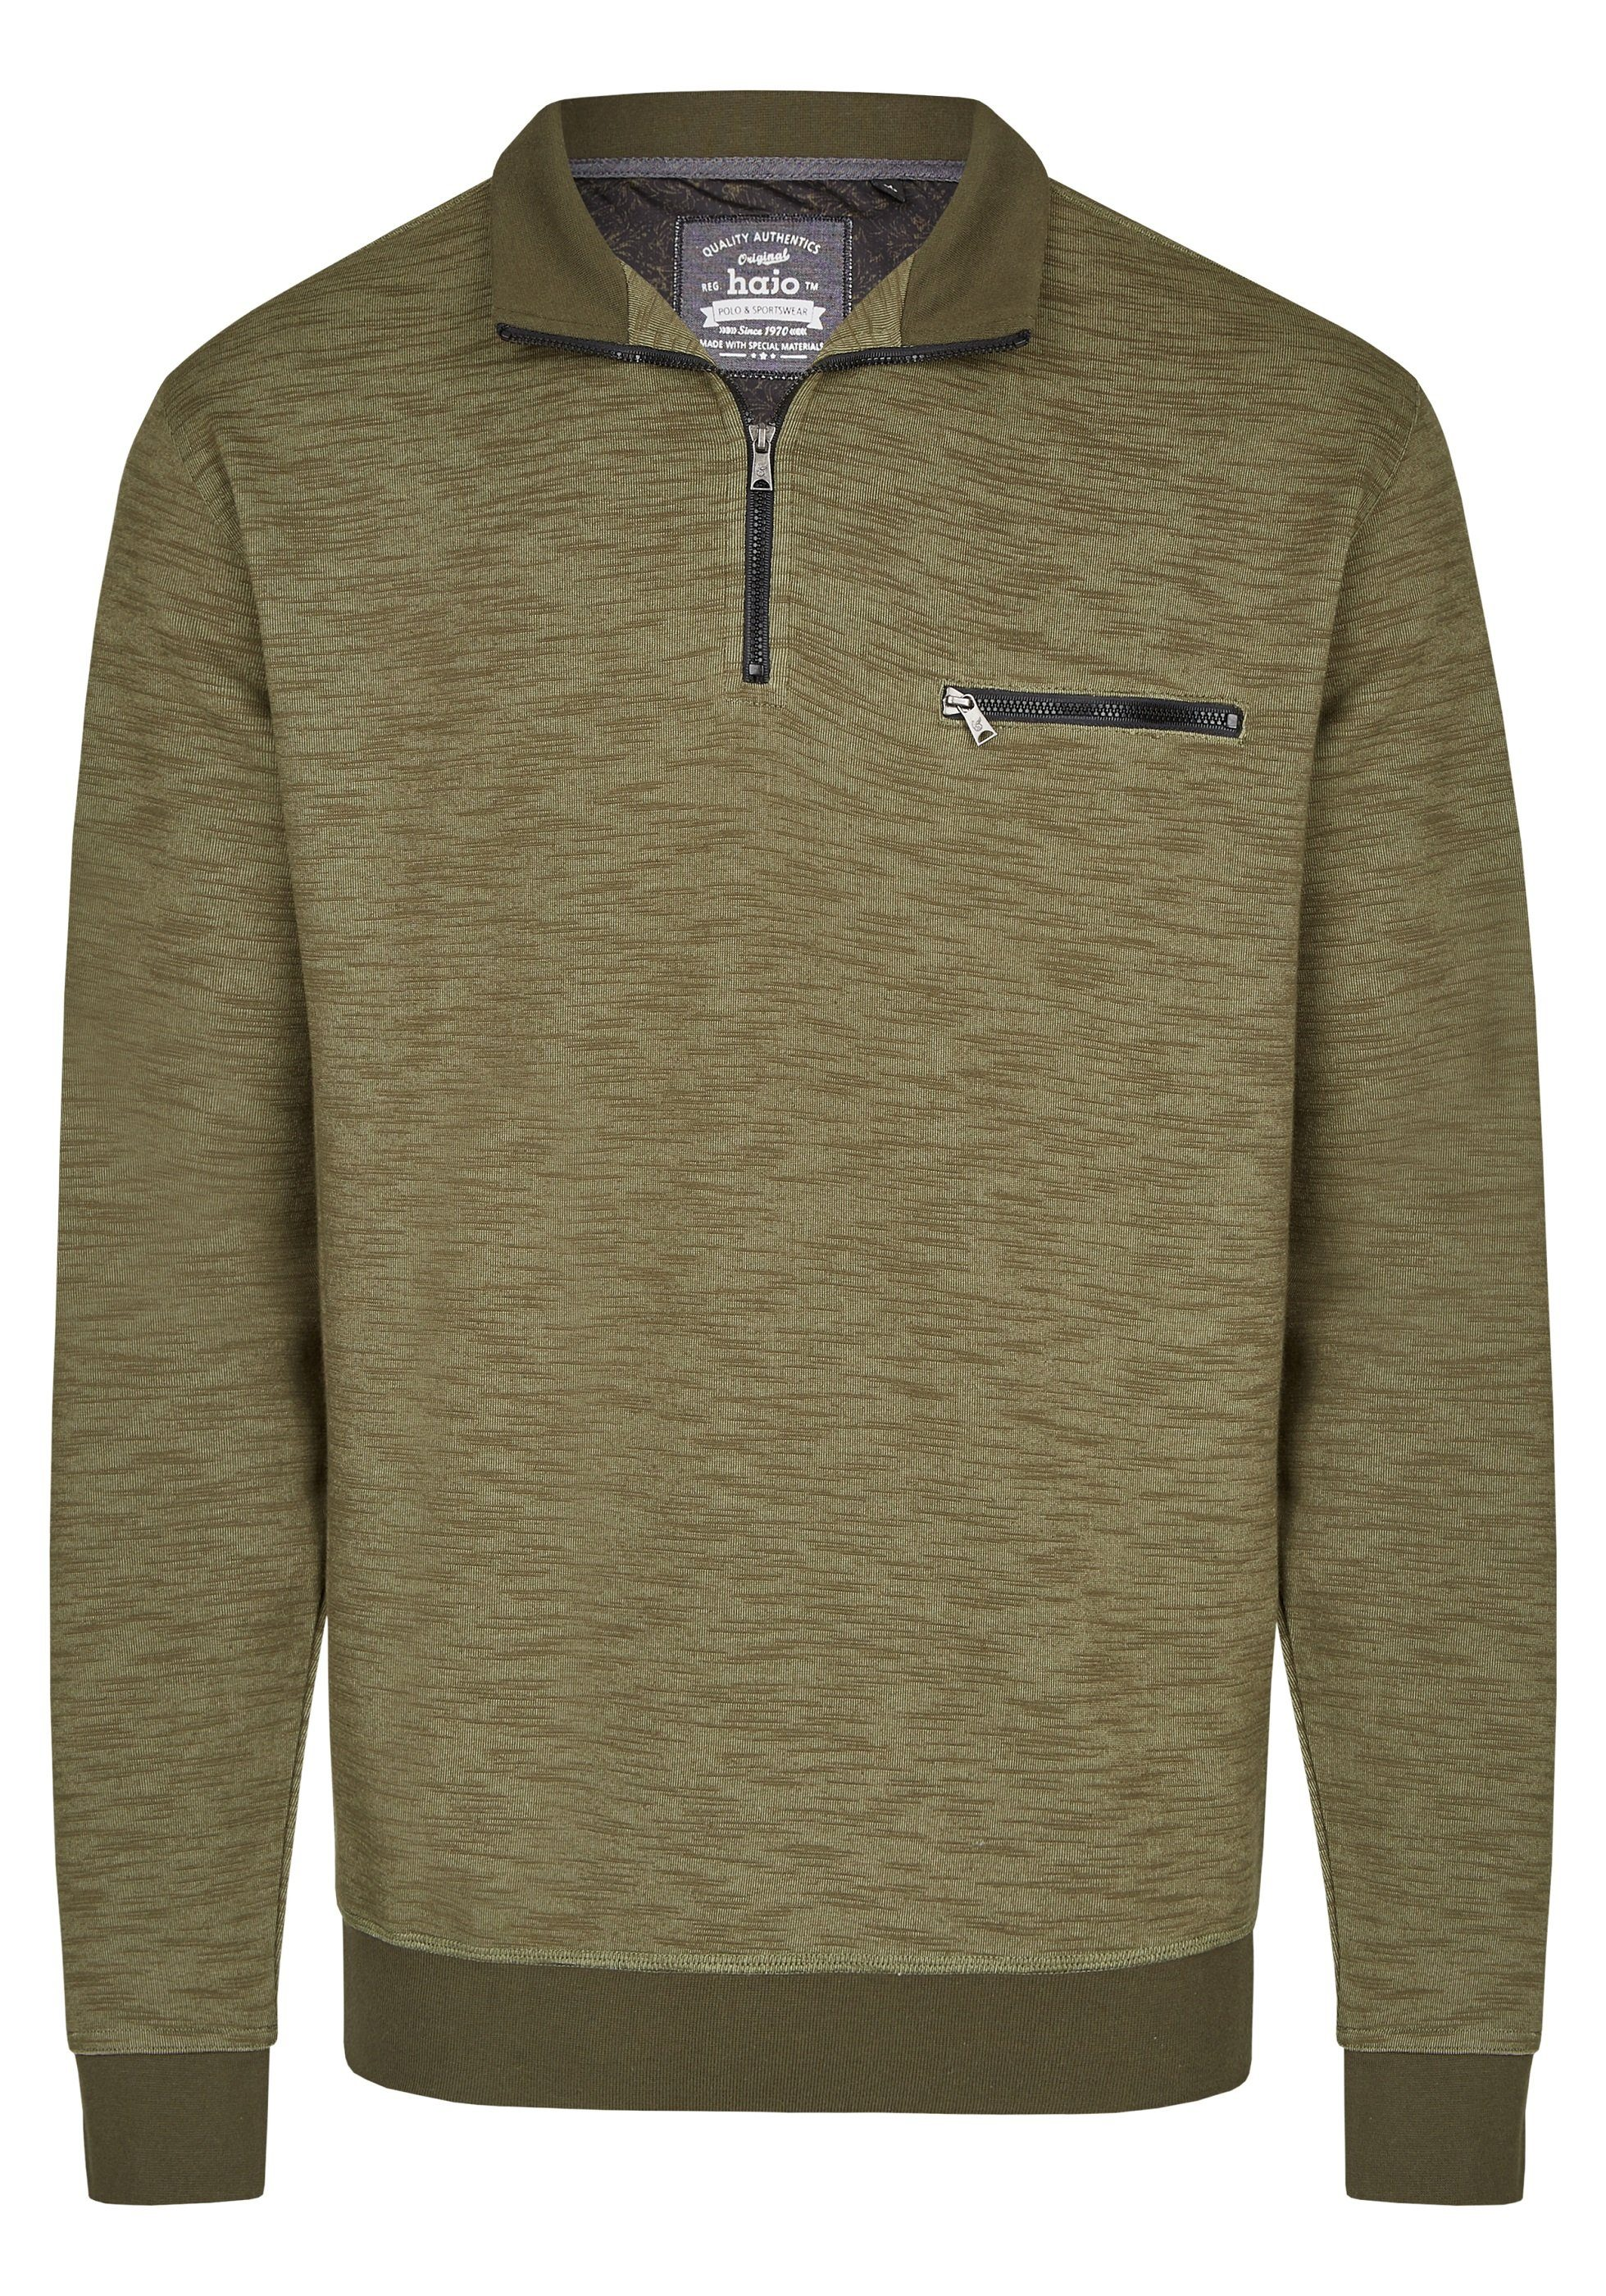 Hajo H Sweatshirt ´´Stay Fresh´´   Bekleidung > Sweatshirts & -jacken > Sweatshirts   Grün   Polyester   HAJO